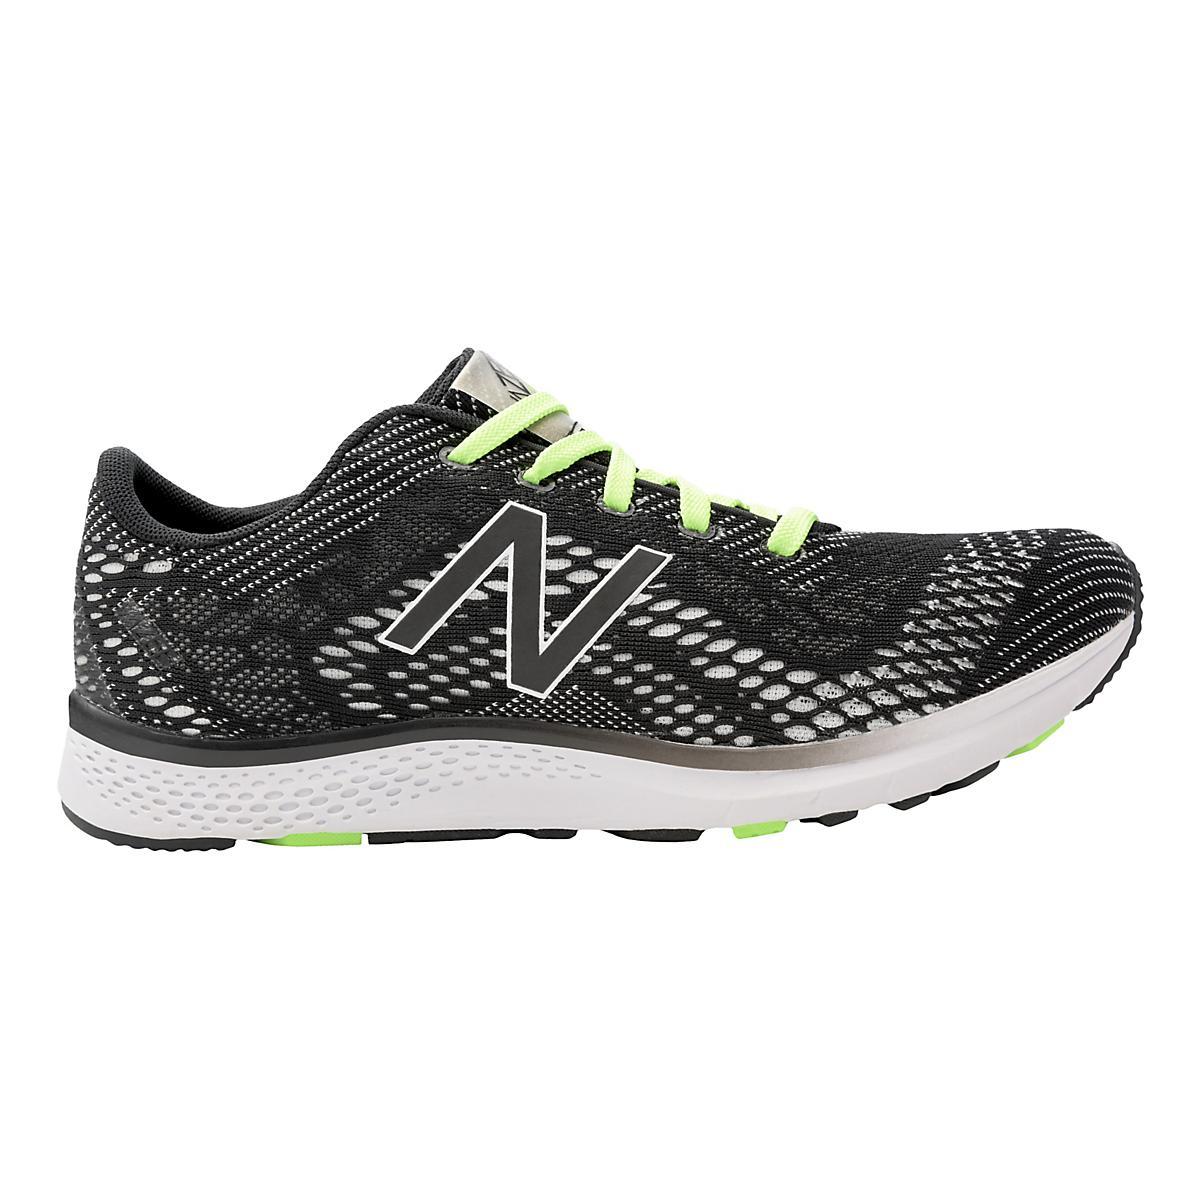 3519f59c8 Womens New Balance Vazee Agility v2 Cross Training Shoe at Road Runner  Sports